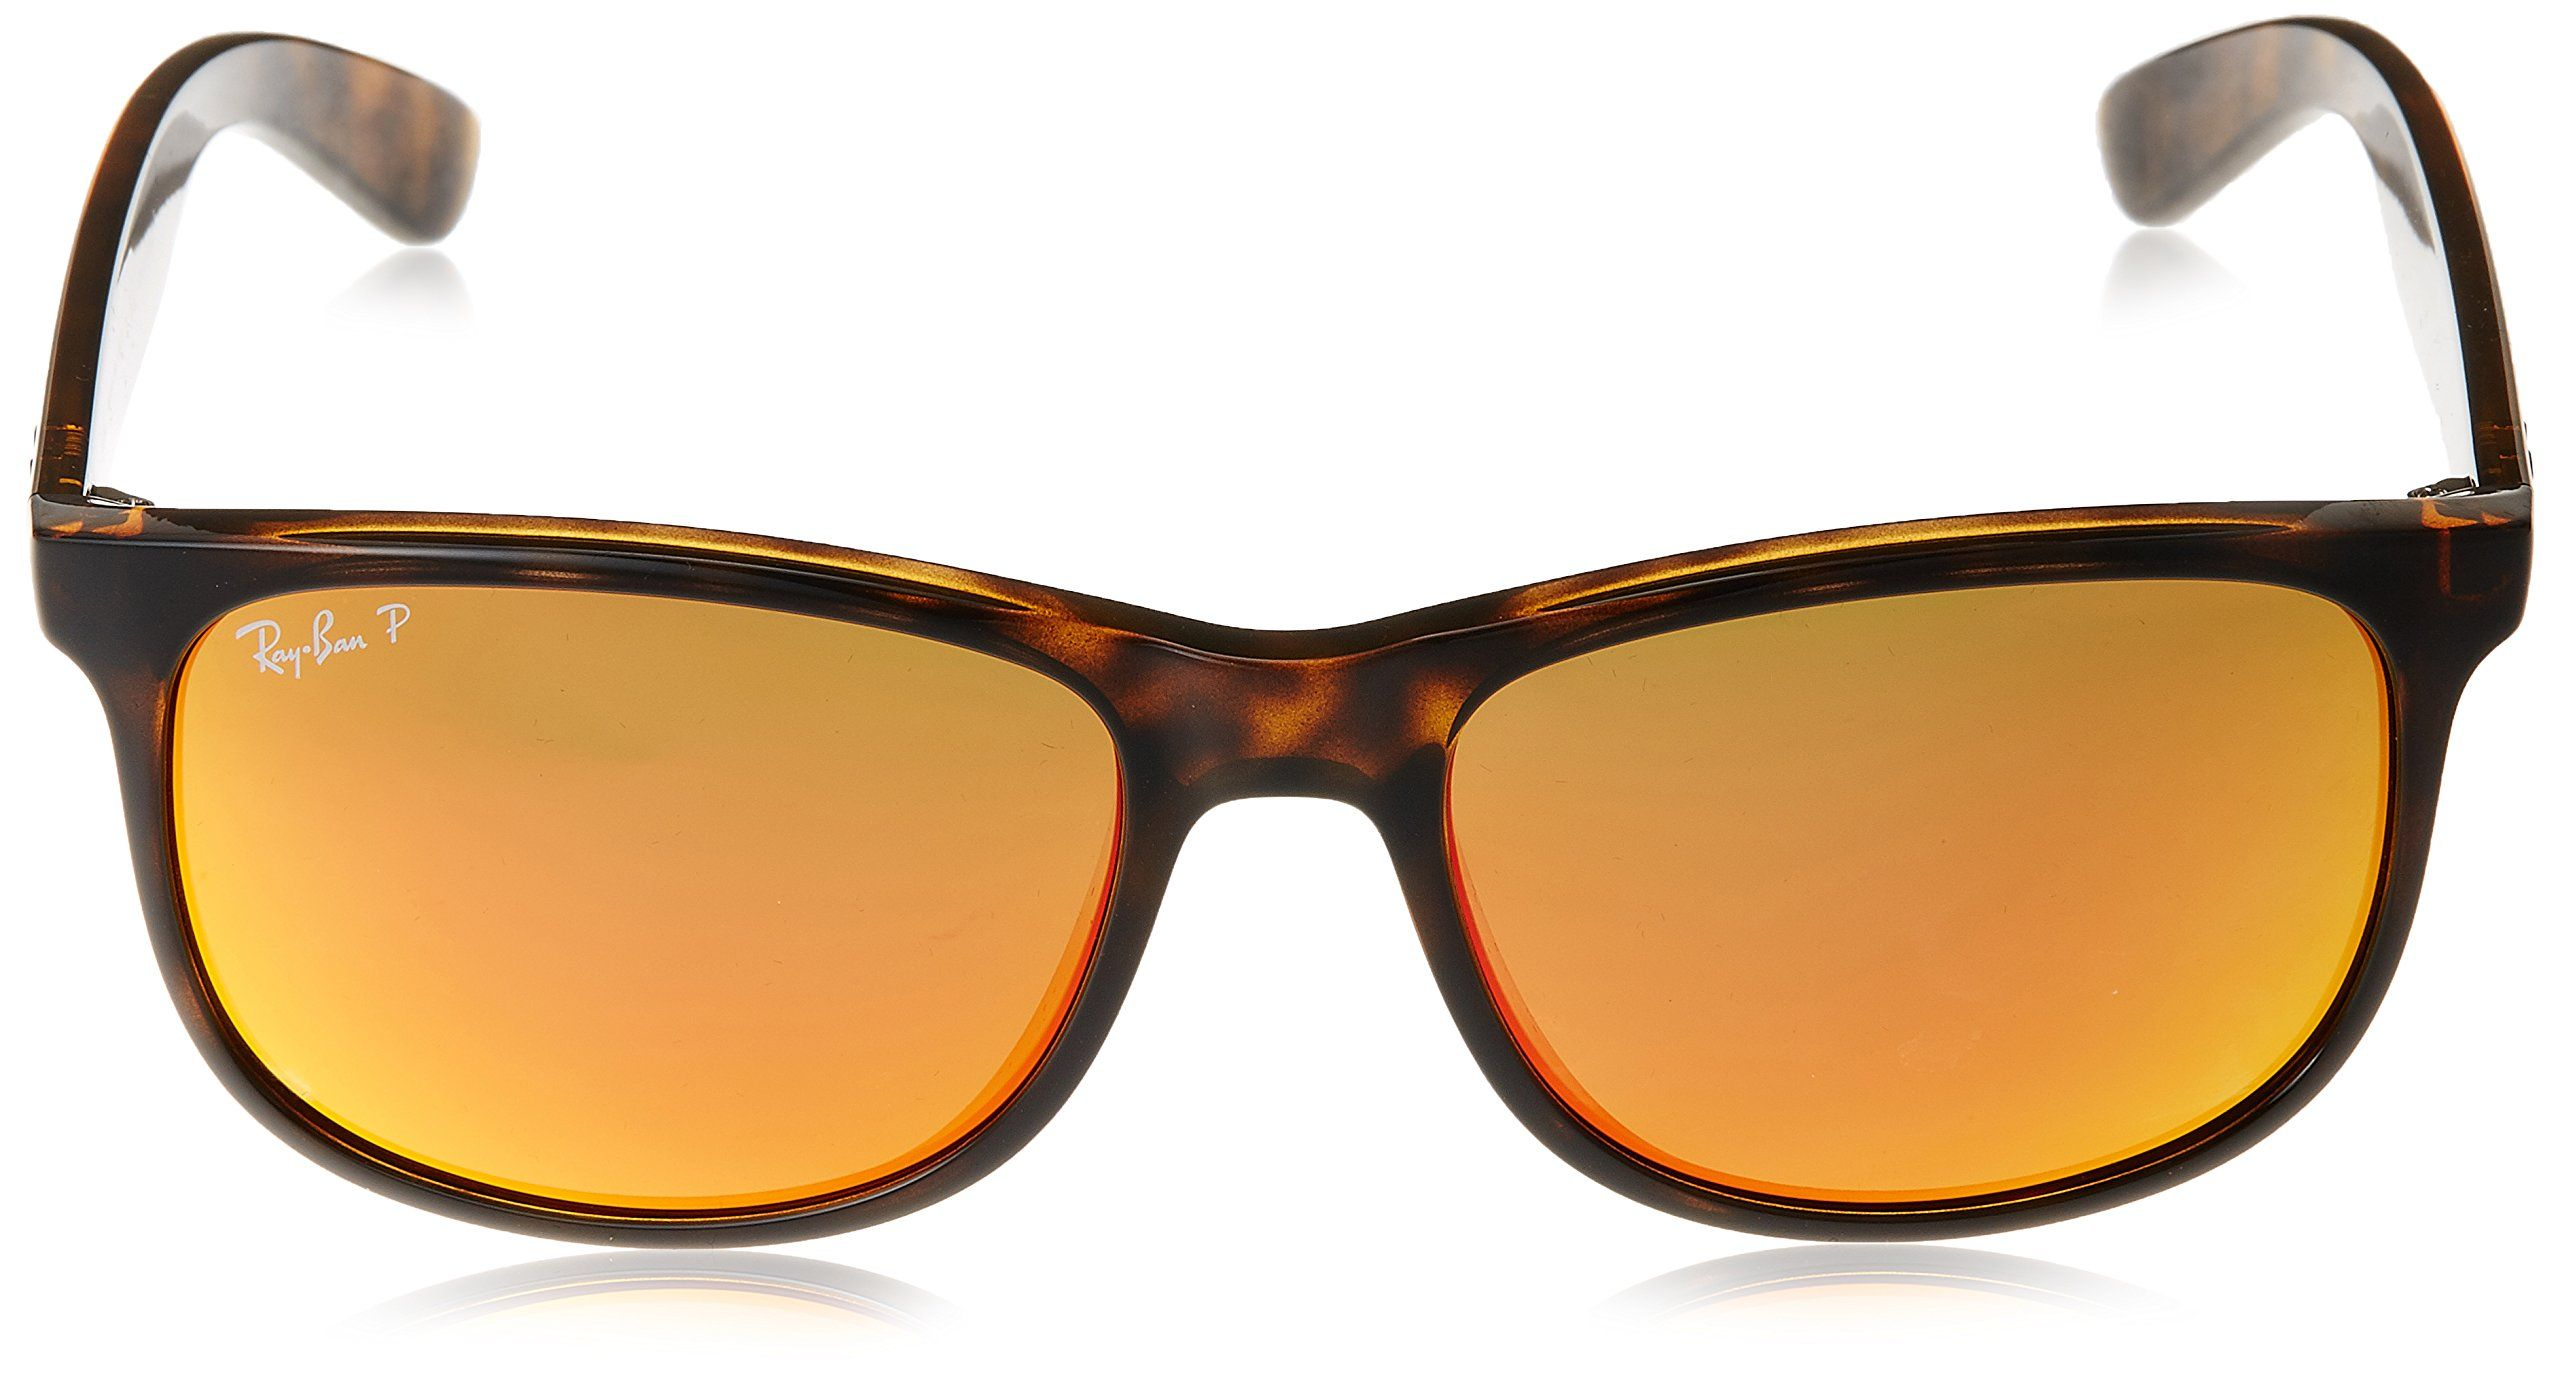 53460691df RayBan ANDY F RB4202F Sunglasses 710 6S57 Shiny Havana Frame Dark Brown  Mirror Orange Polar -- For more information